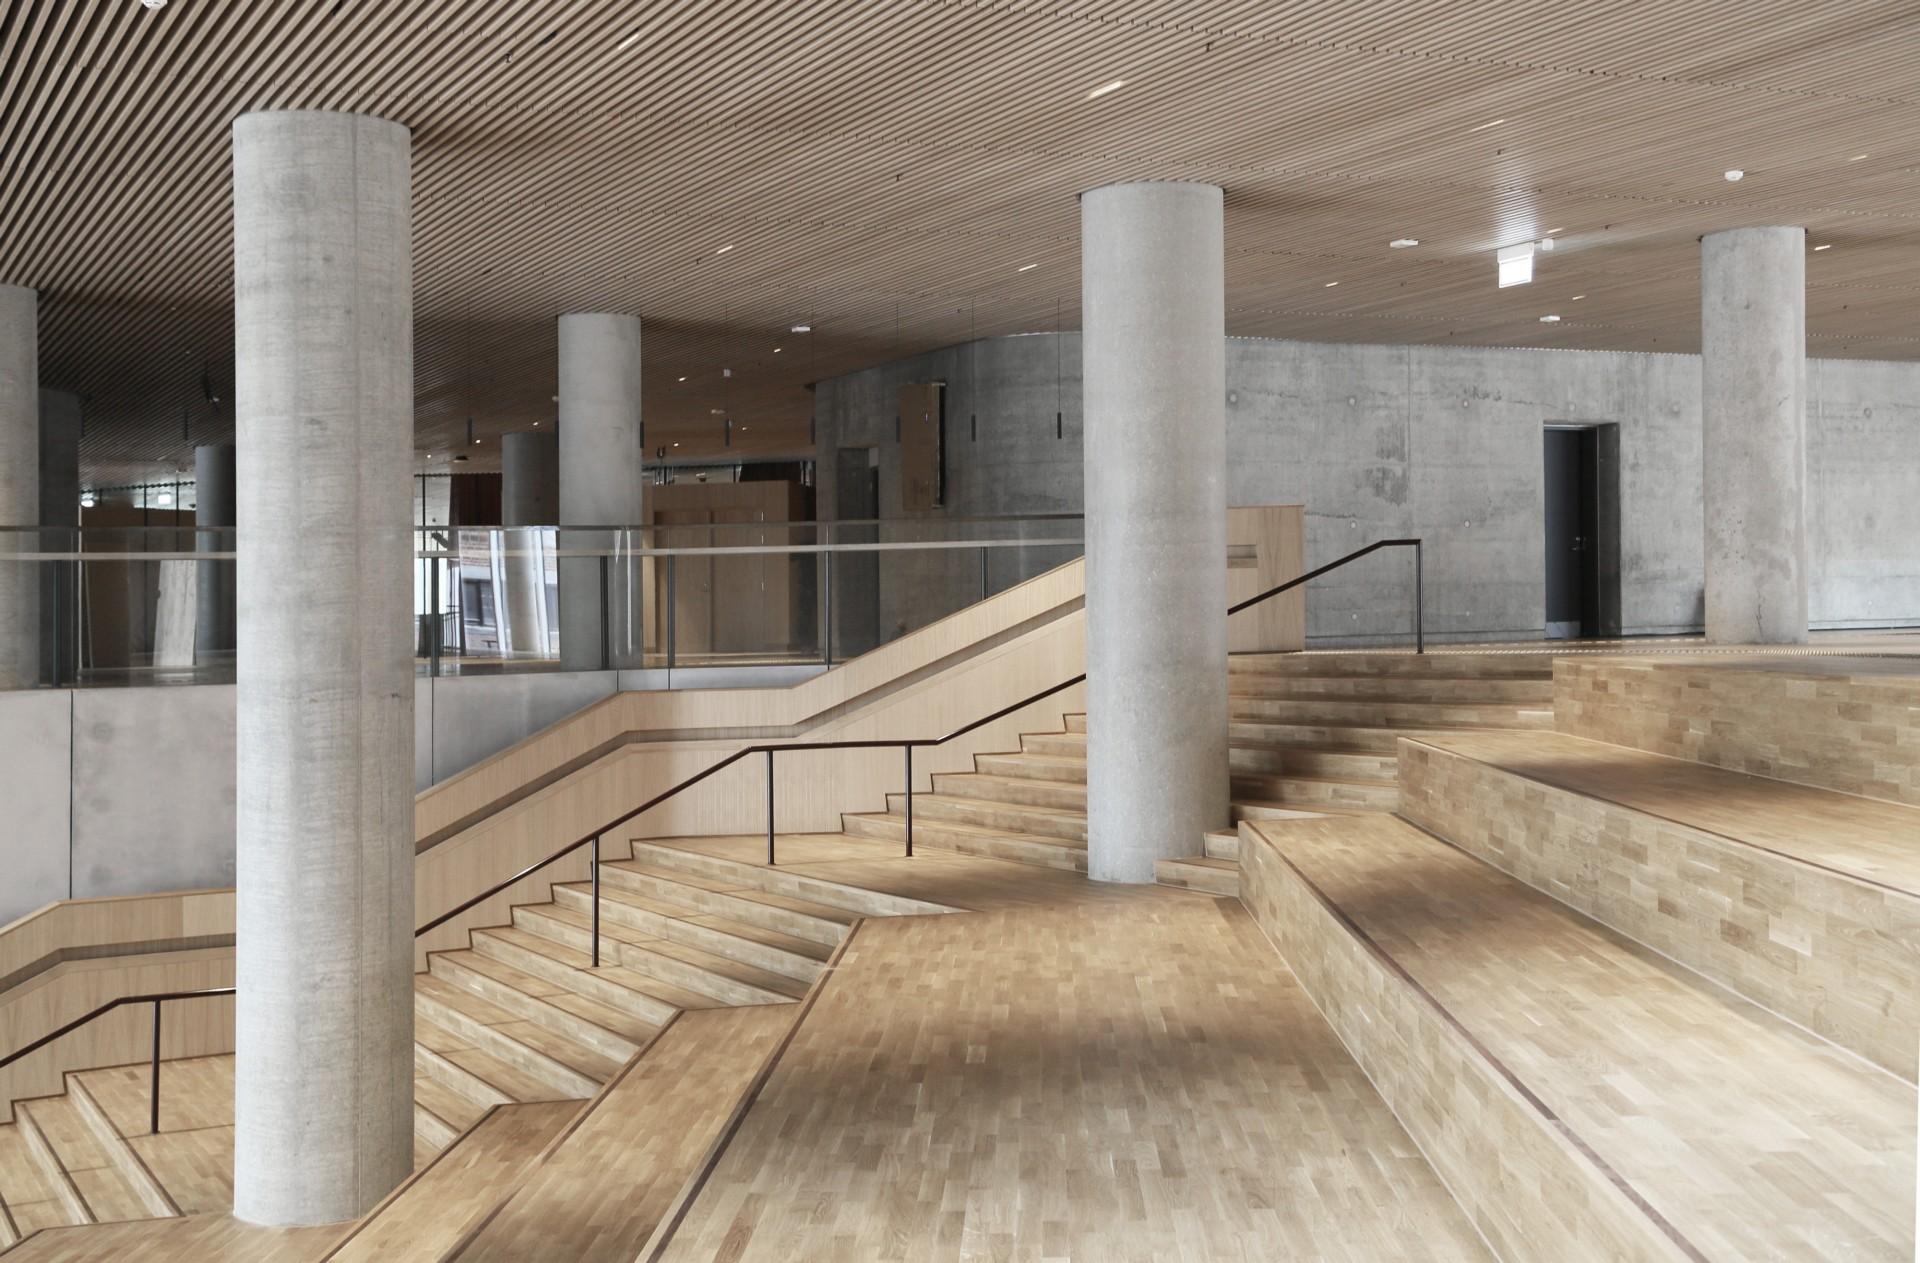 C.F. Møller Architects Maersk Tower iconic building in Copenhagen